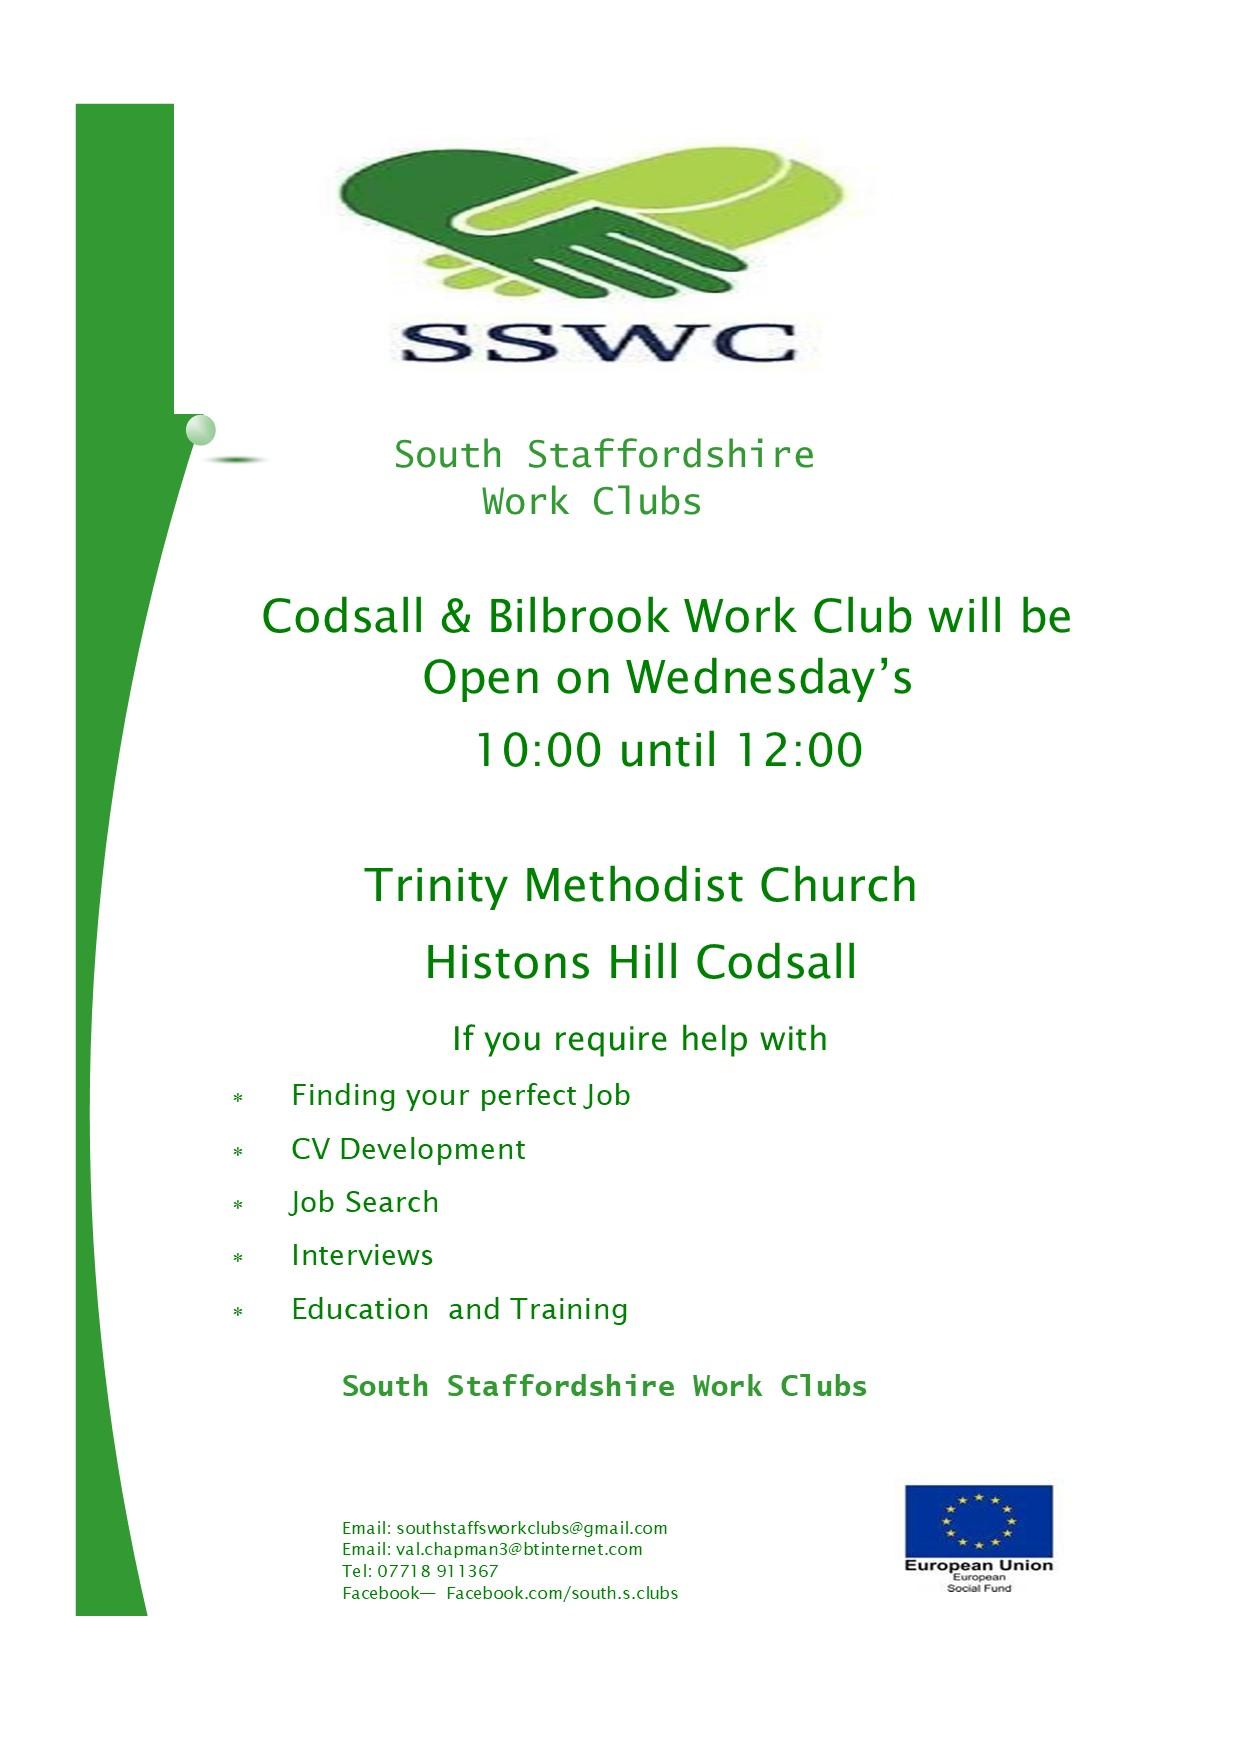 Codsall & Bilbrook Work Club